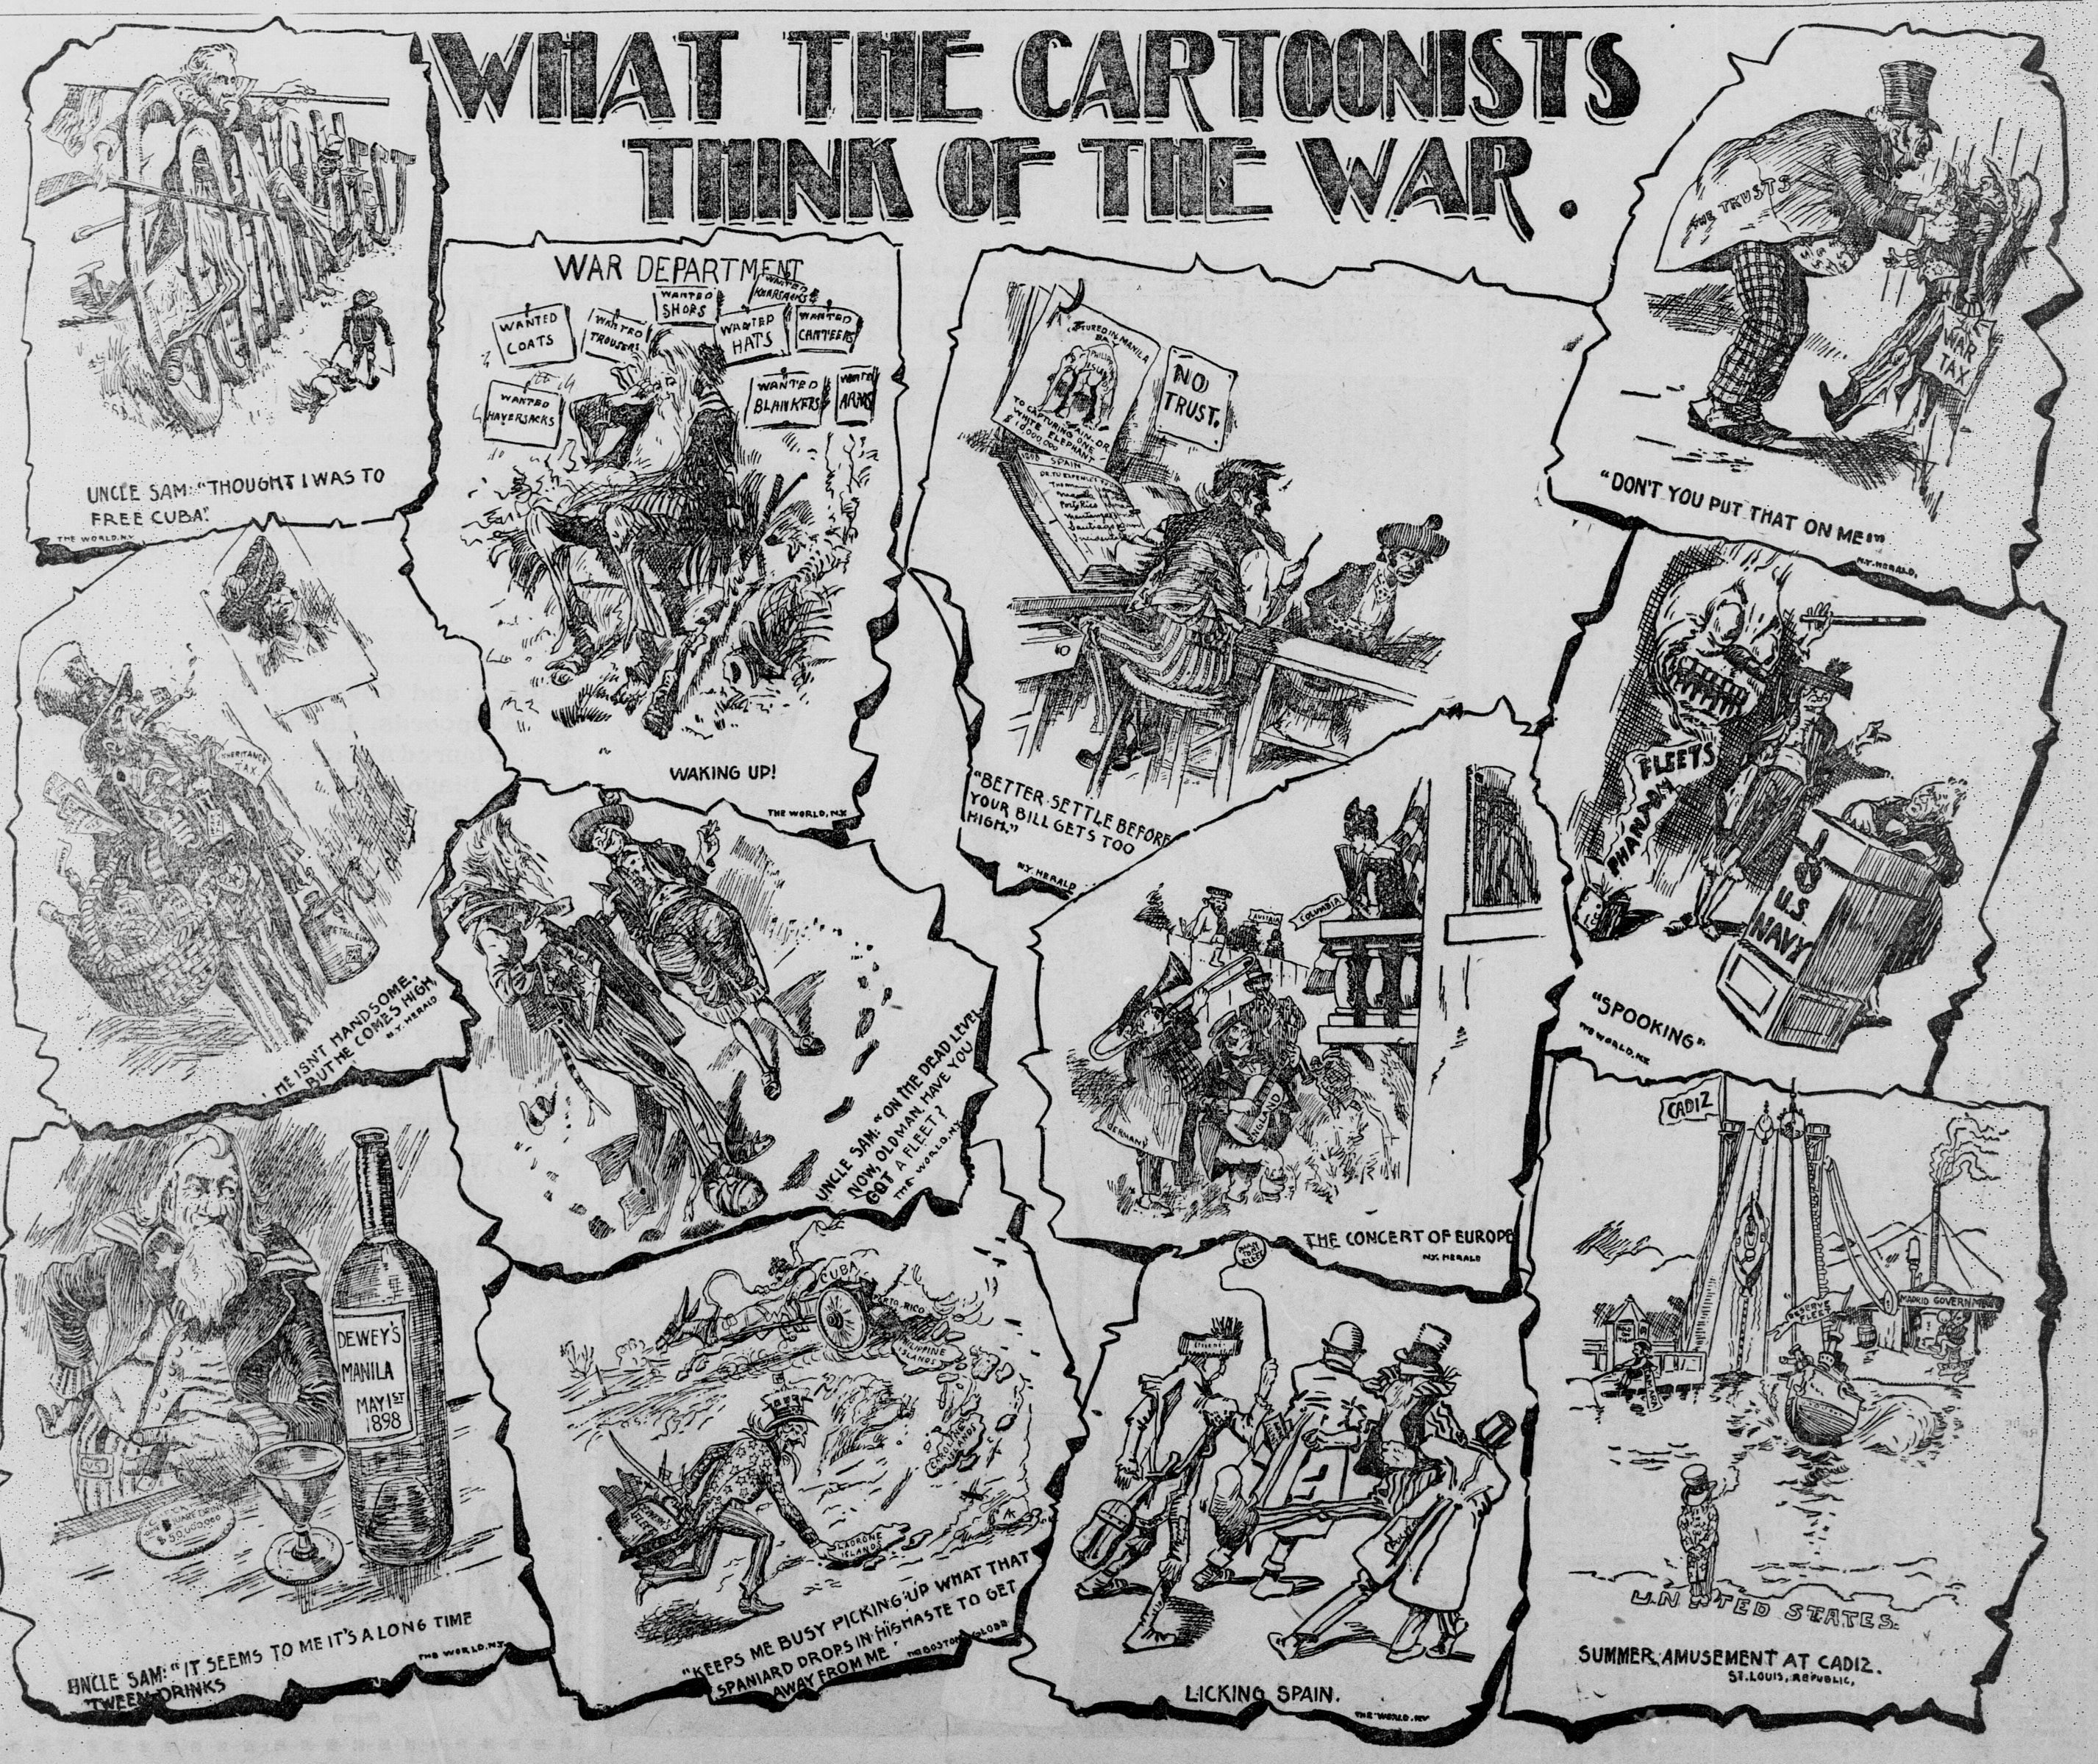 La guerra hispano-estadounidense de 1898 en viñetas 18